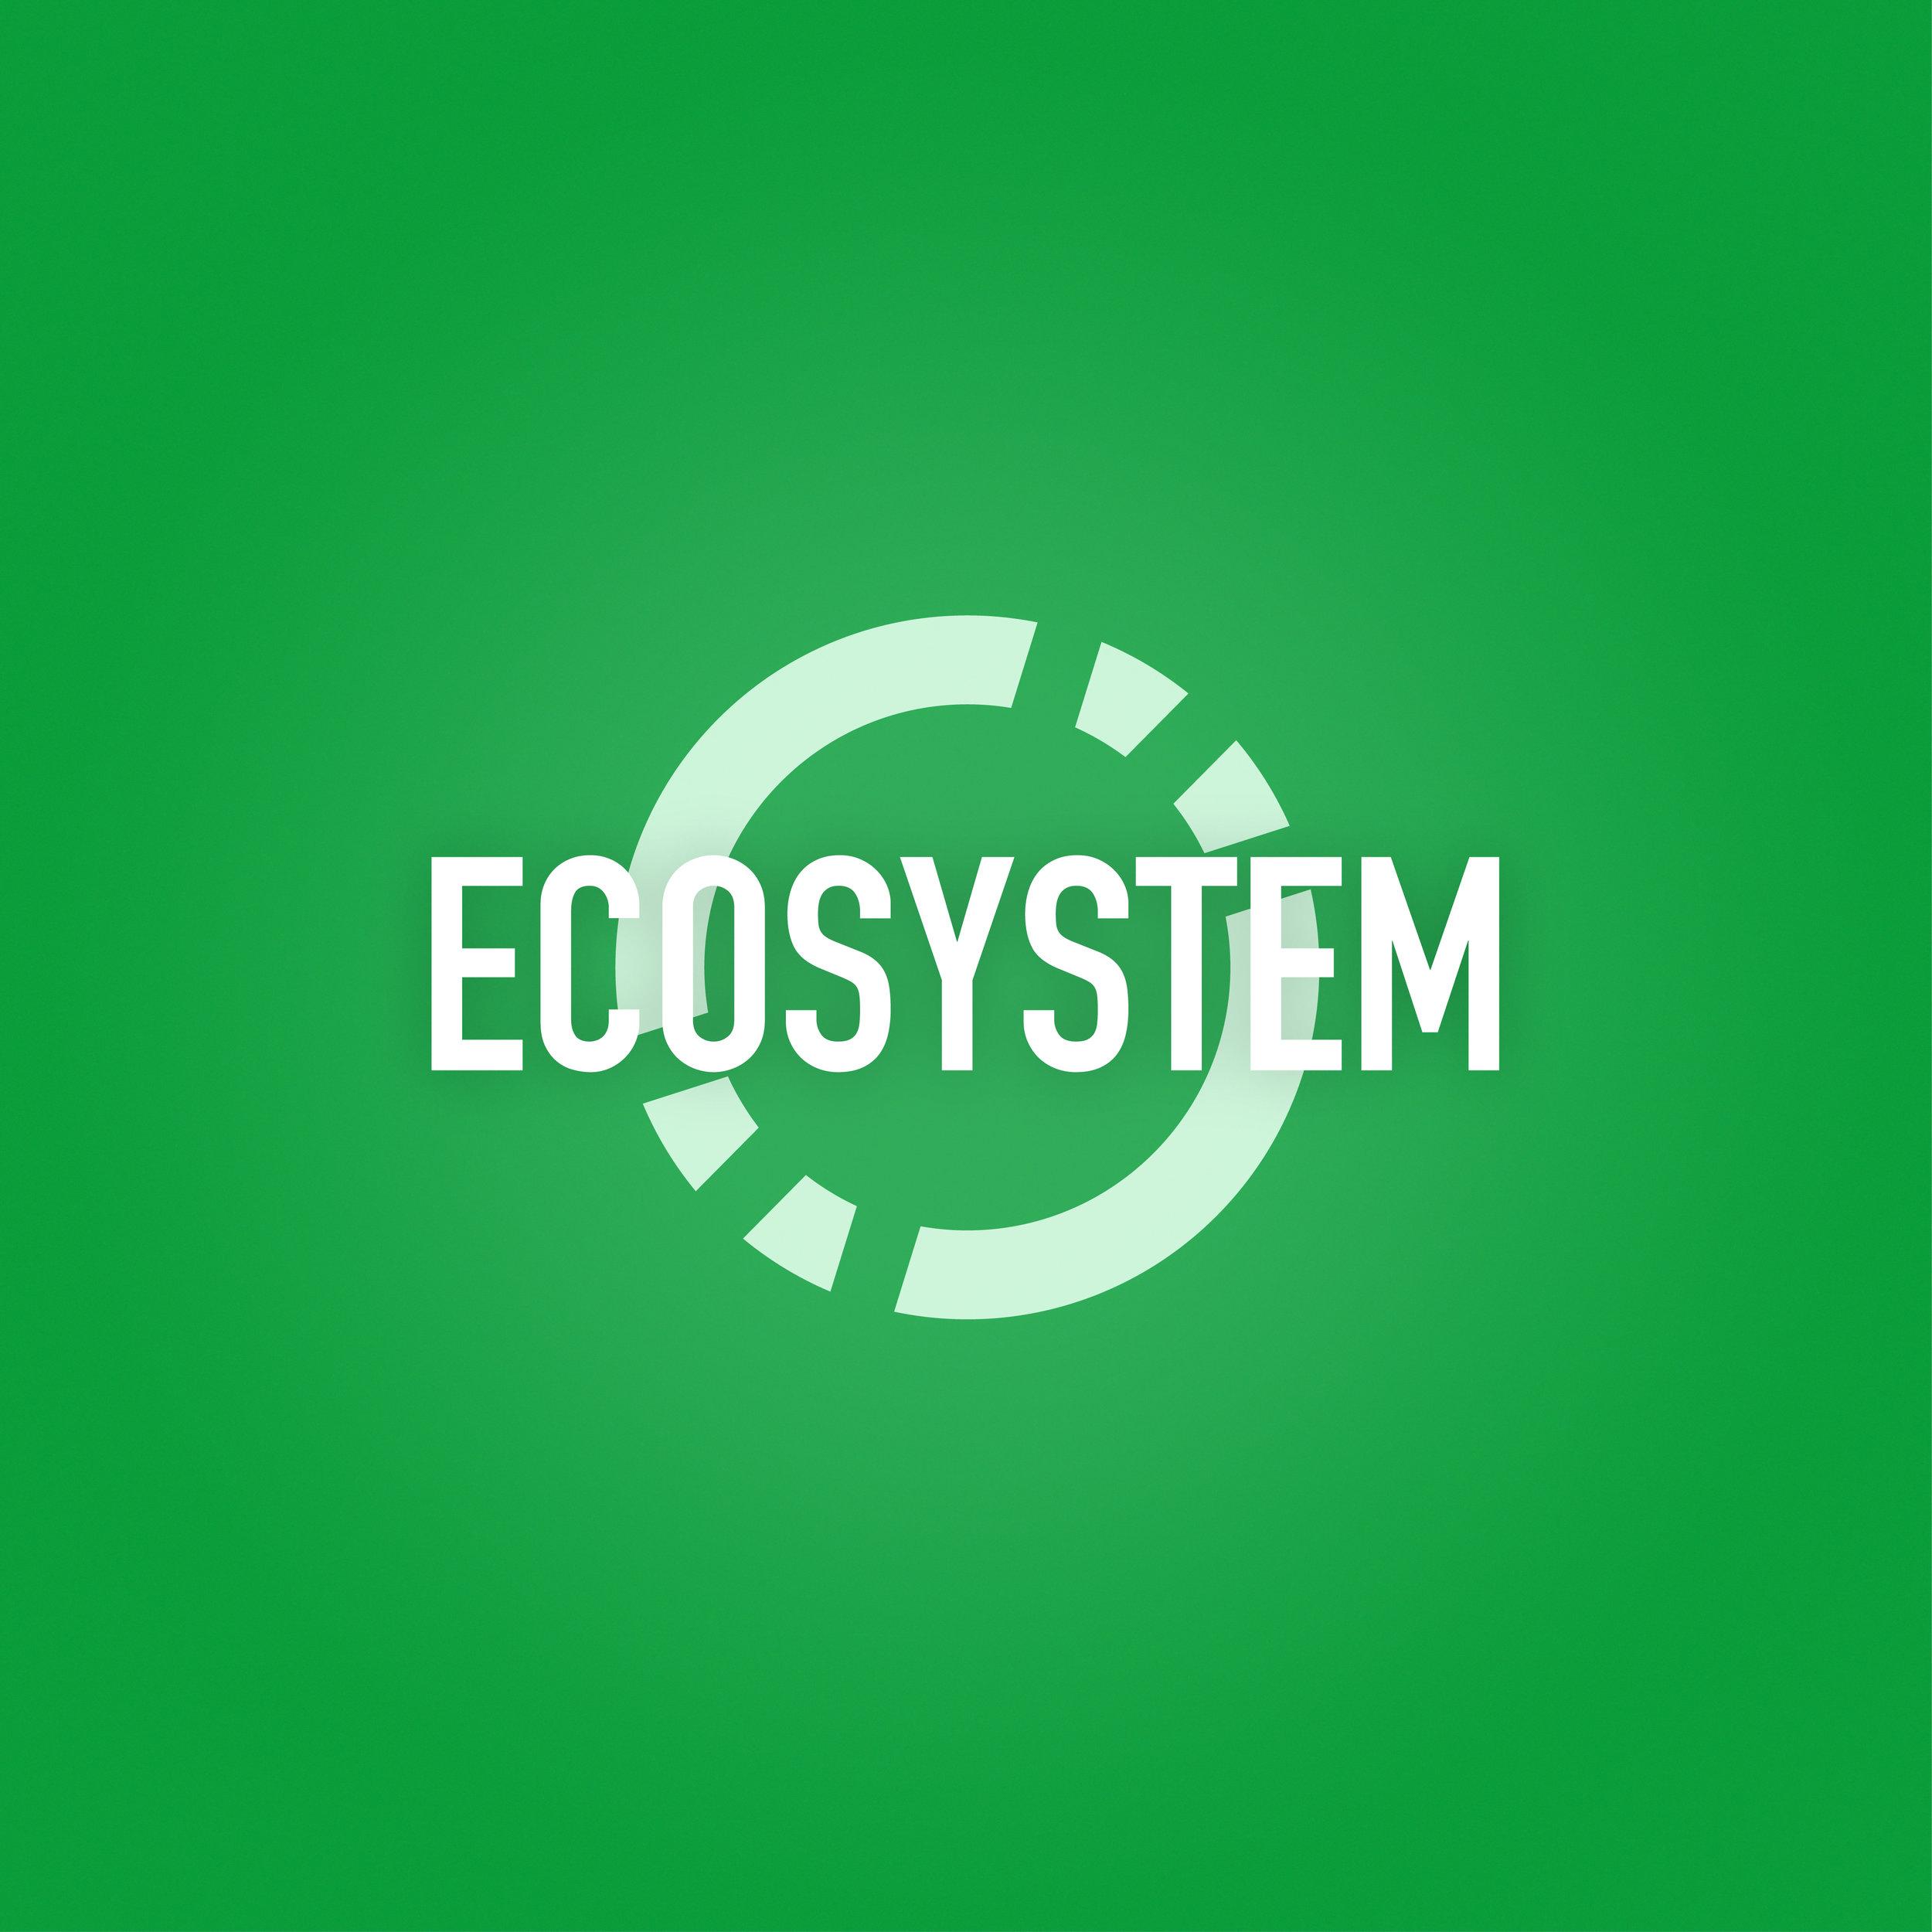 ecosystemcover